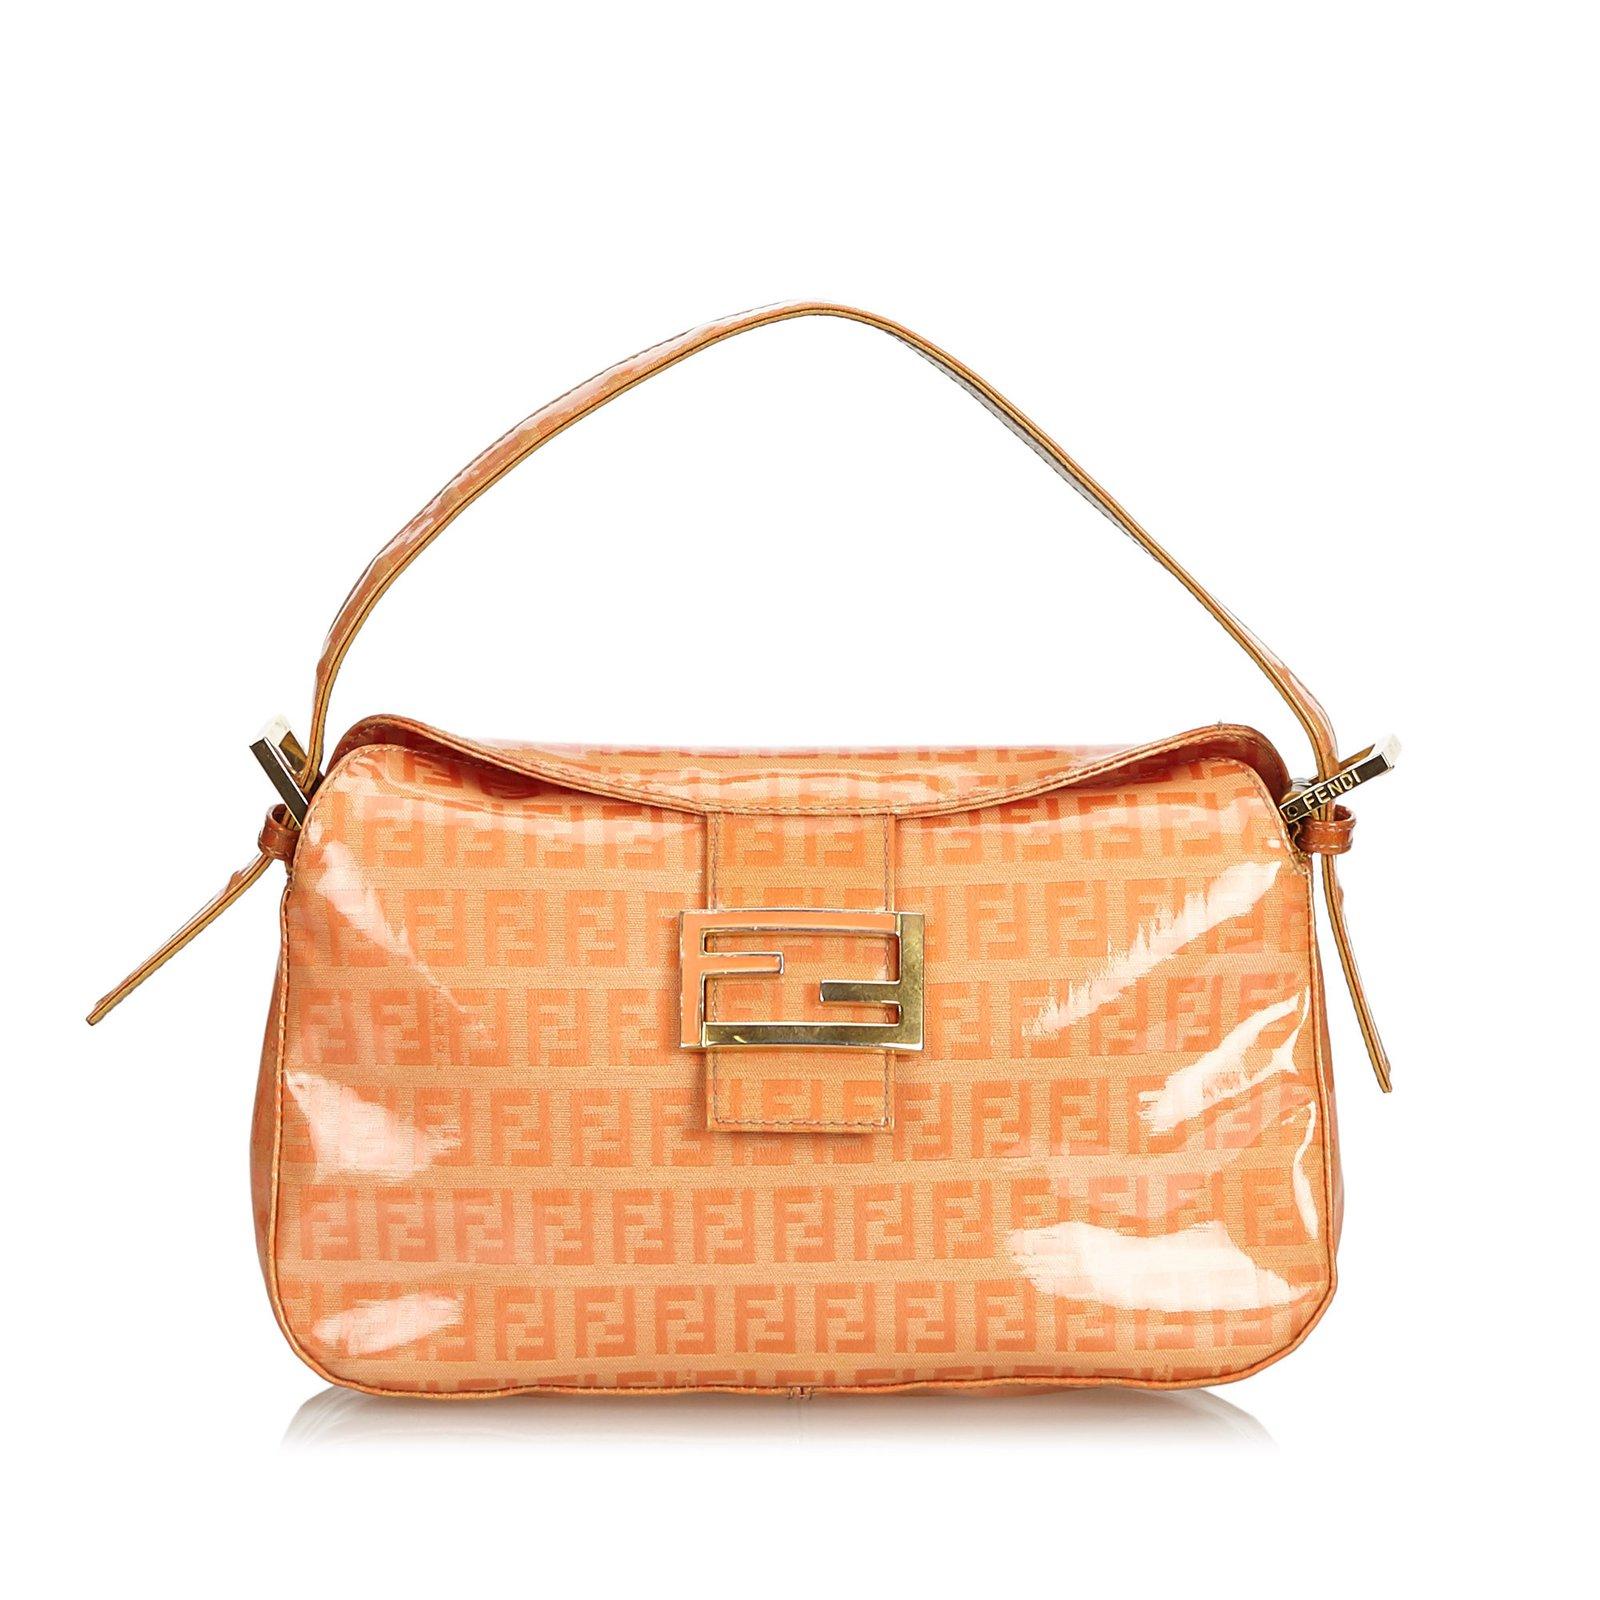 d4ebd1d61eaf Fendi Zucchino Baguette Bag Handbags Other Orange ref.102155 - Joli ...